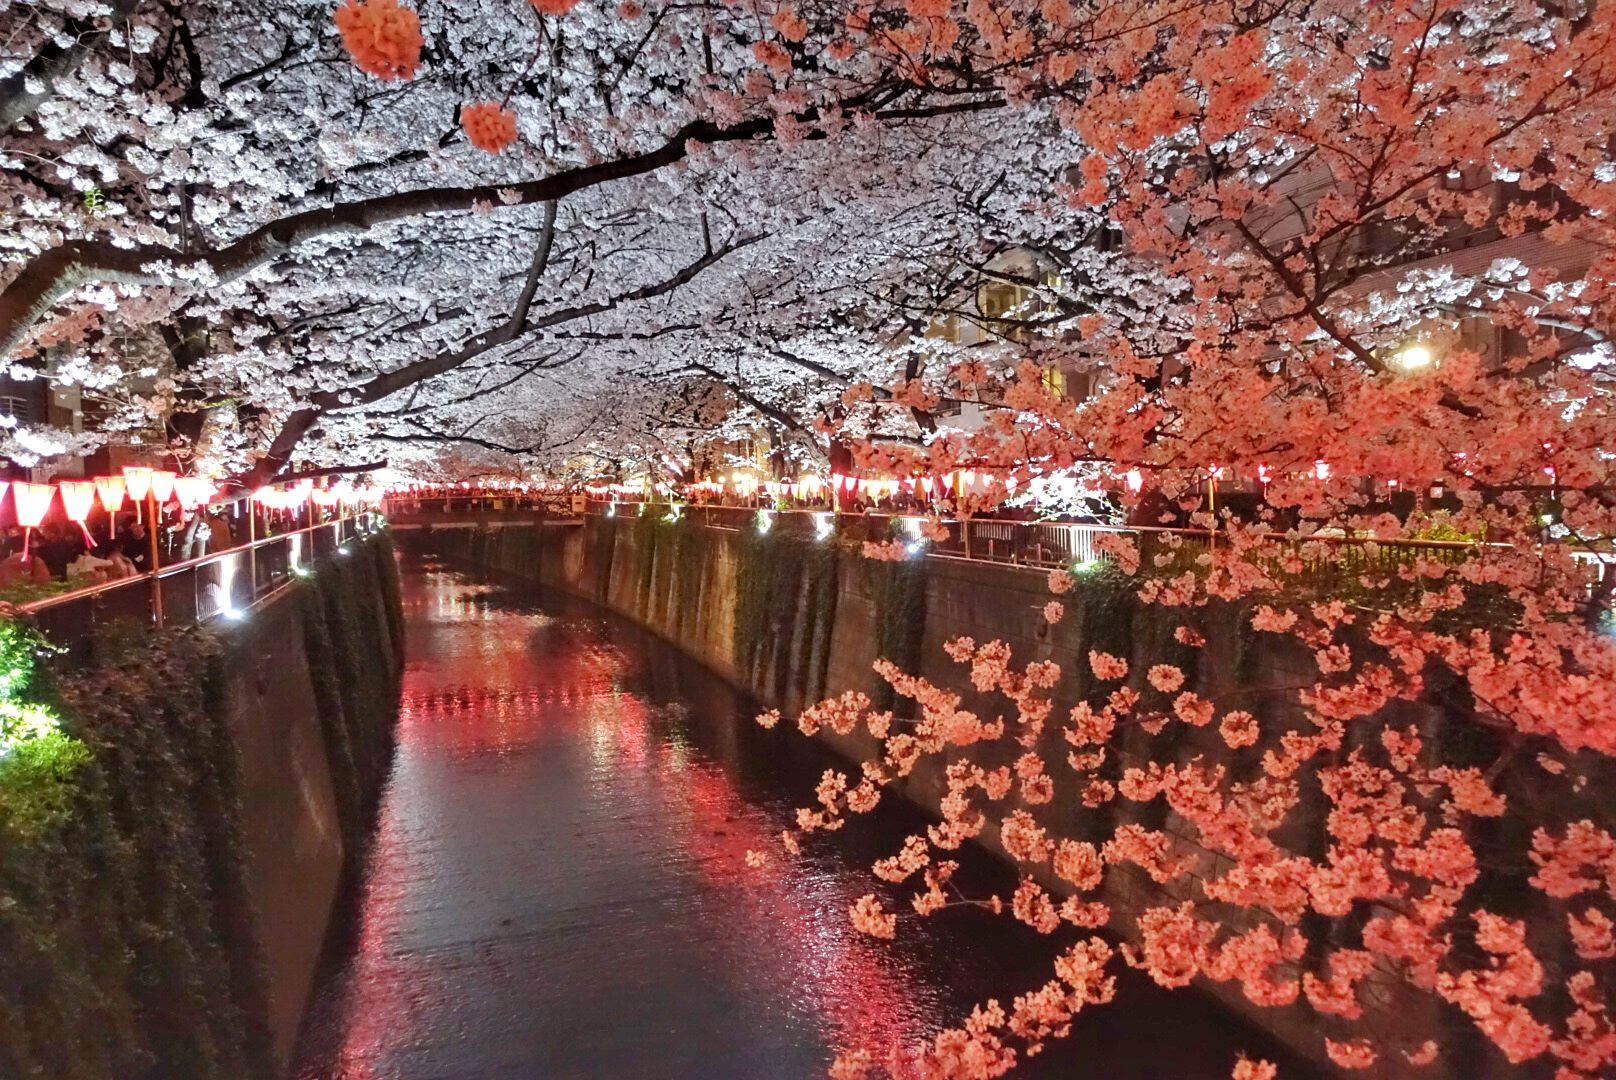 Japan Cherry Blossoms Lit Up At Night In Naka Meguro Tokyo For Yozakura Beautiful Sakura At Night Discover The Best Thin Aesthetic Japan Travel Japan Travel